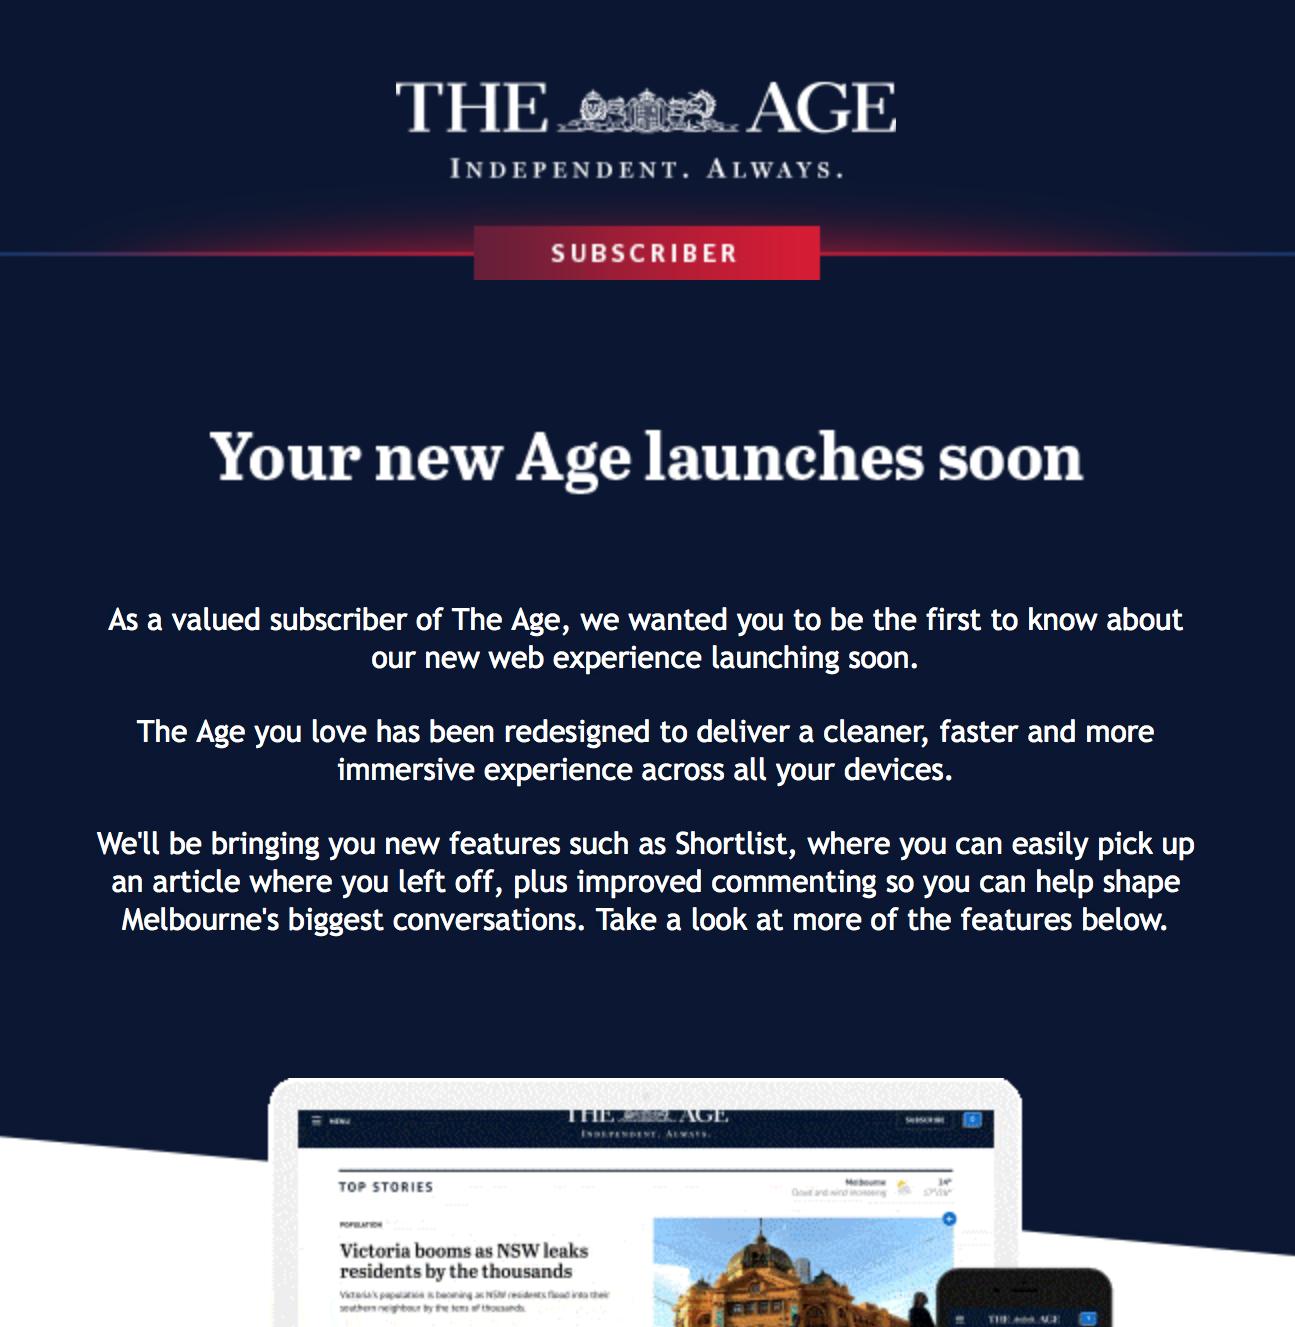 Experience in updating website